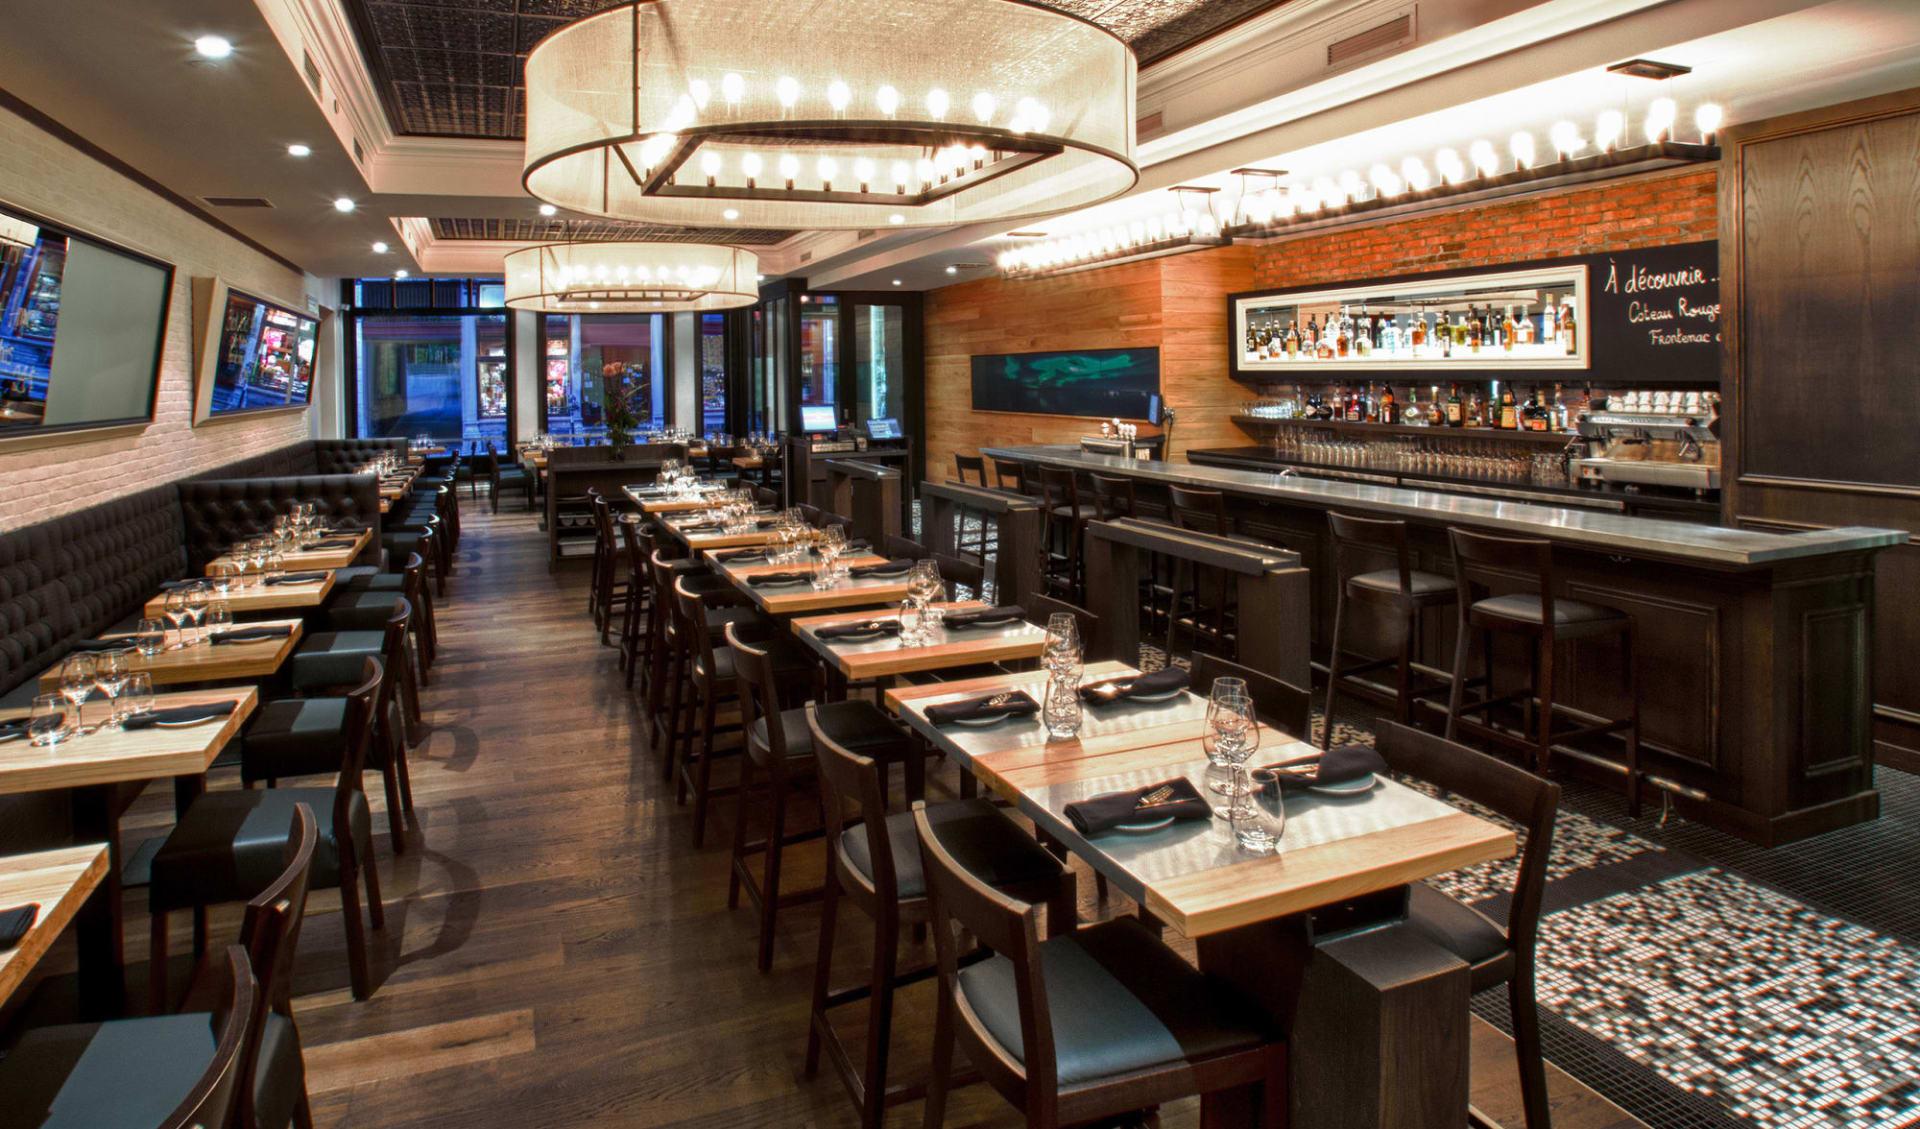 Hotel Manoir Victoria in Québec City: facilities_Manoir Victoria_RestaurantChezBoulay